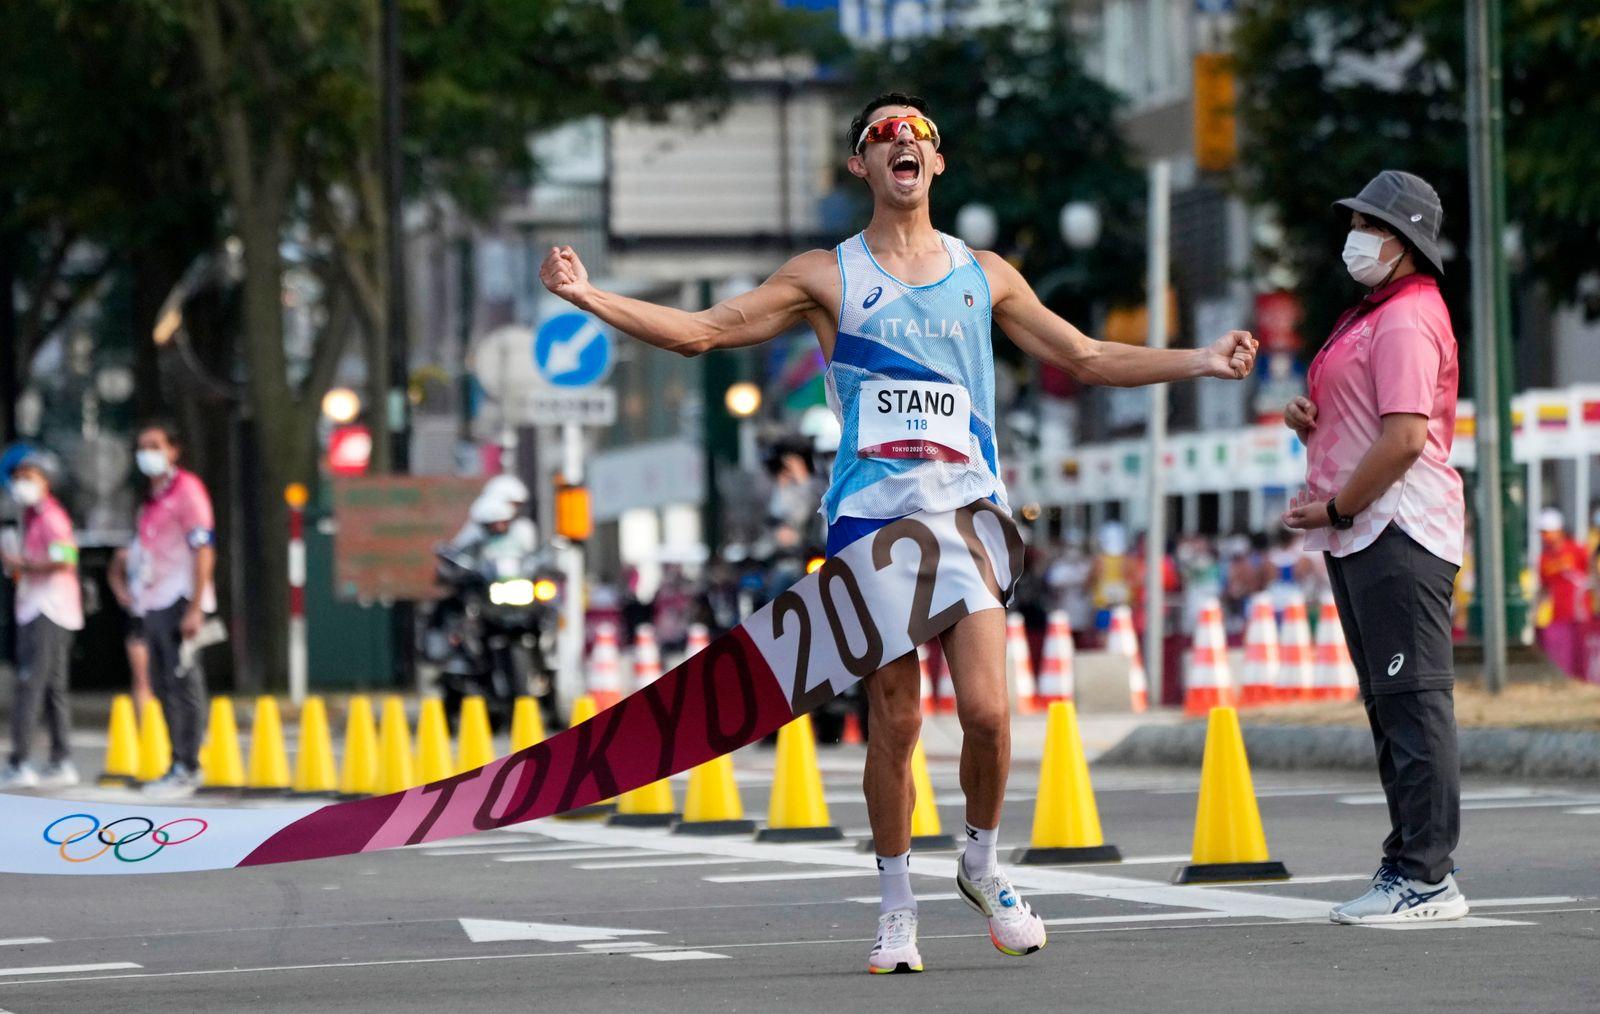 Olympic Games 2020 Athletics